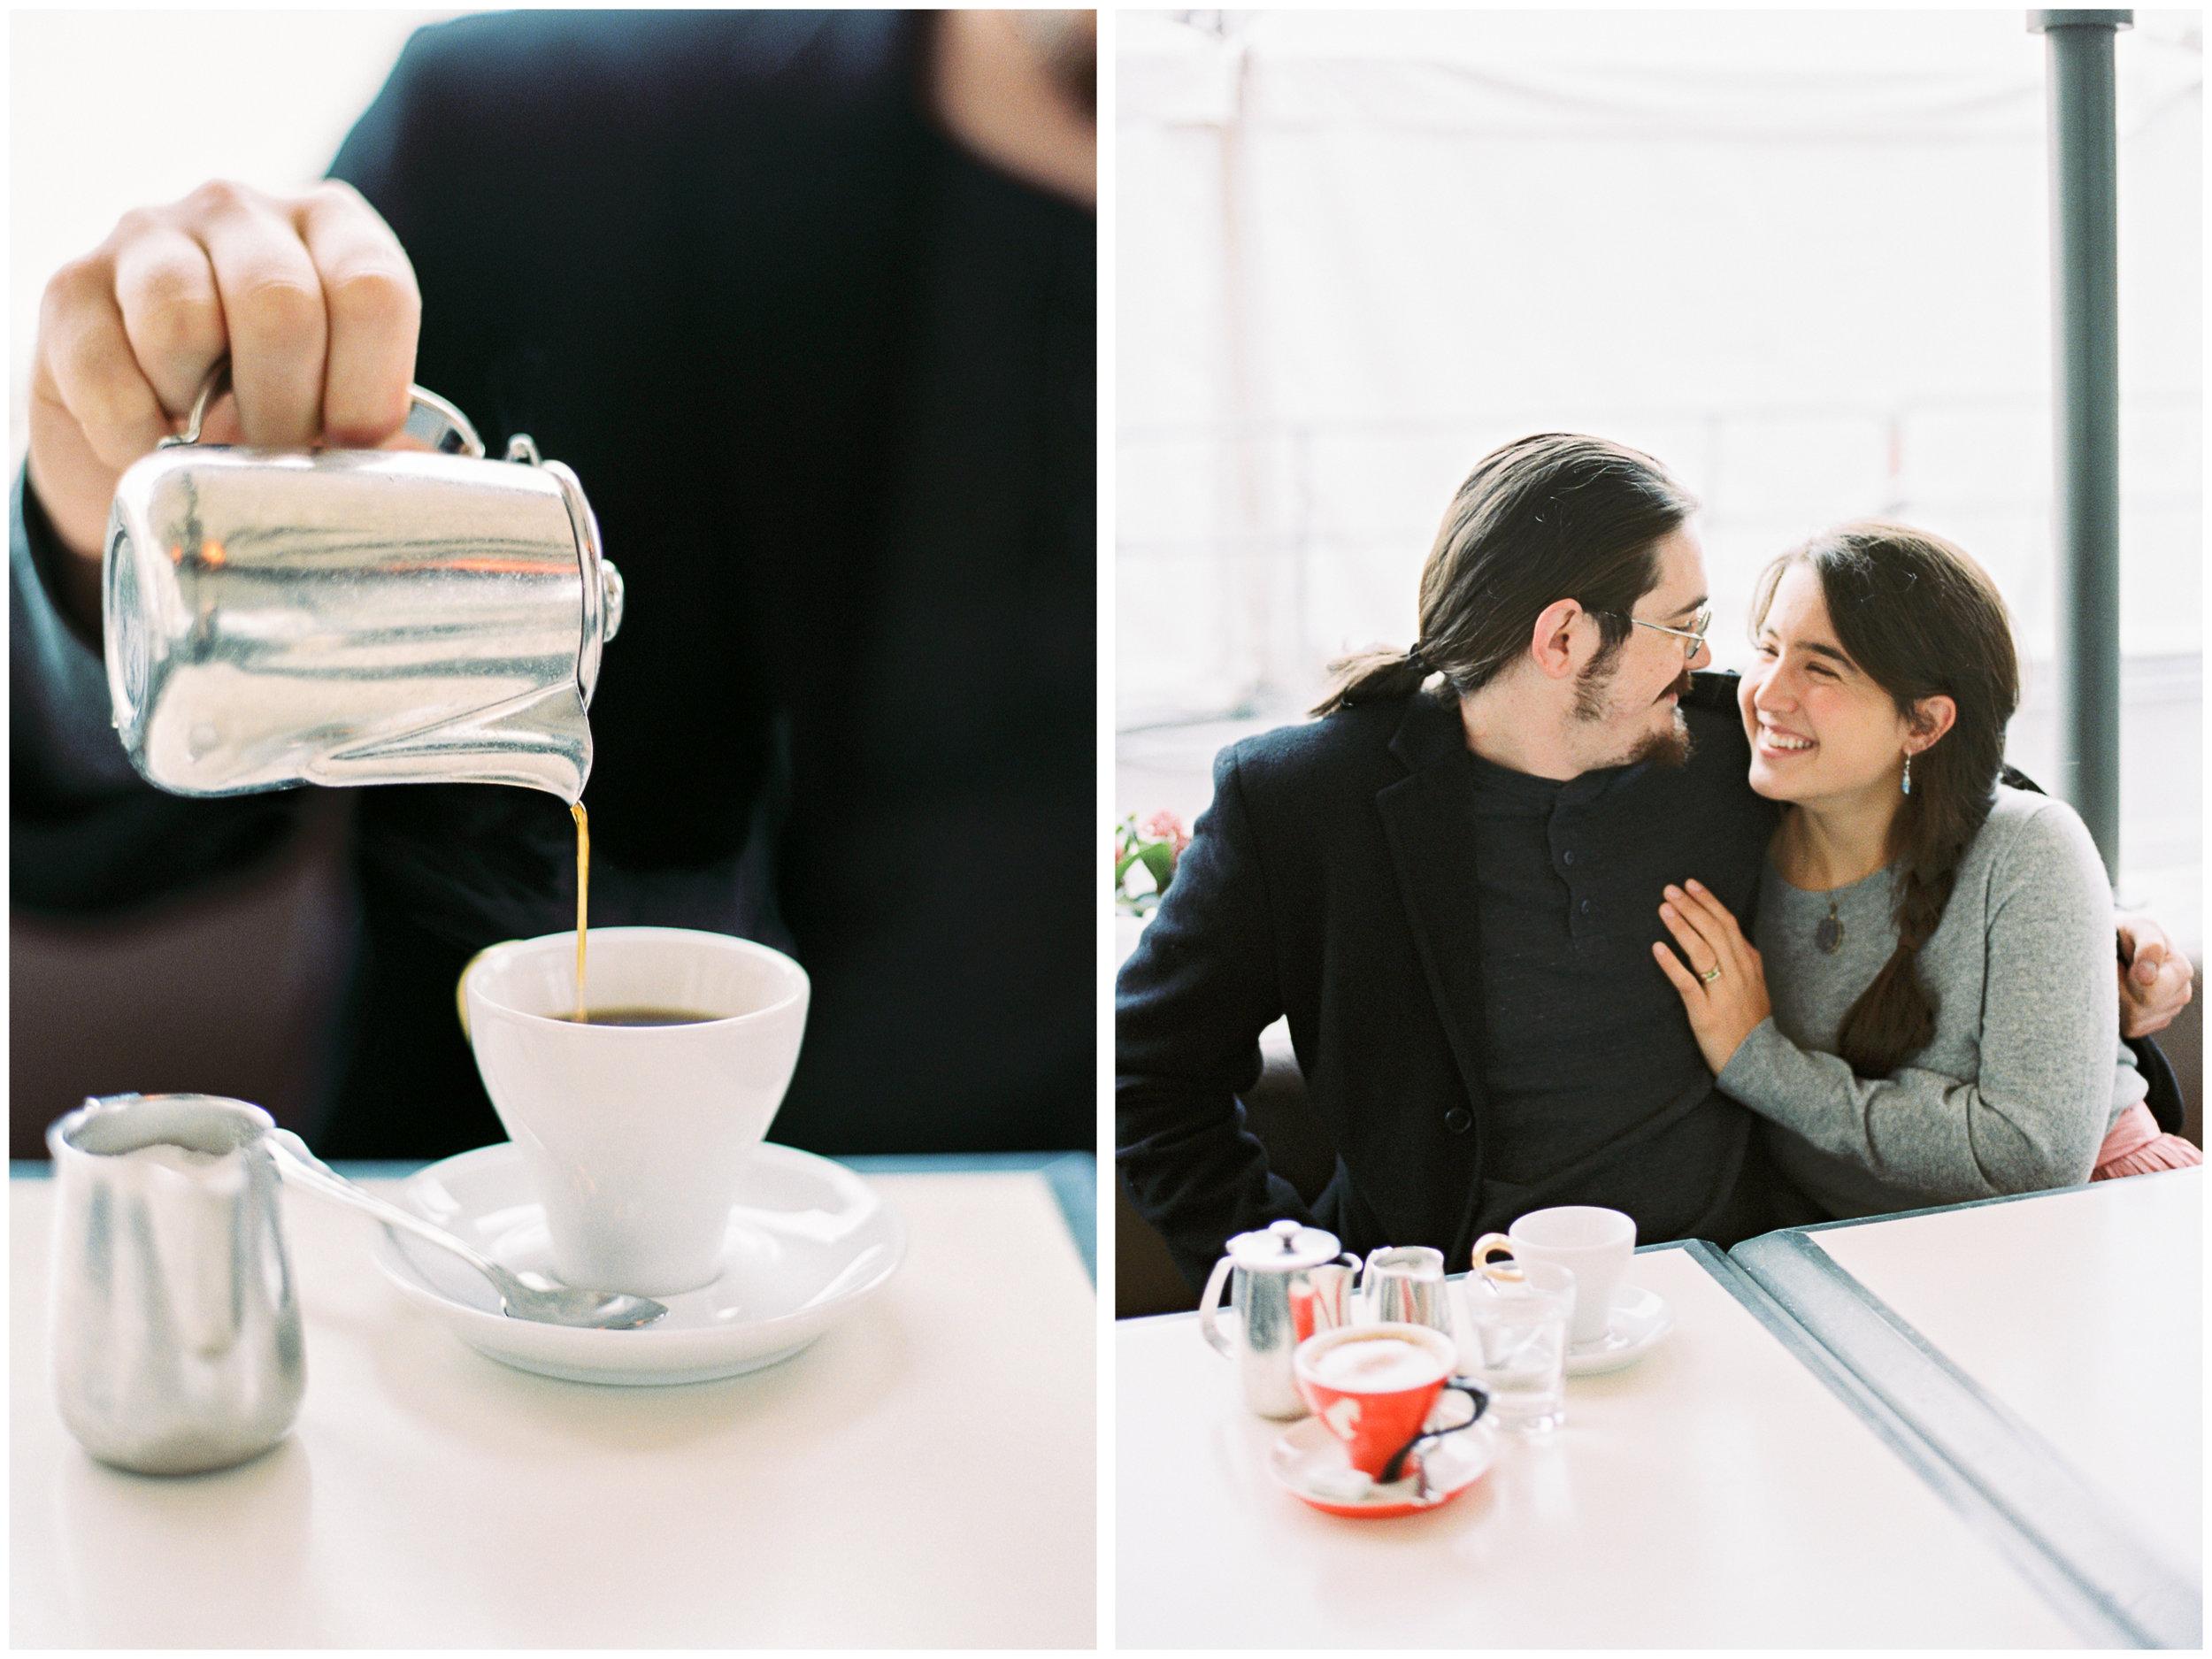 Cafe Portraits | Vienna, Austria | Fuji400H | Contax645 | Film Photographer | Michelle Mock Photography